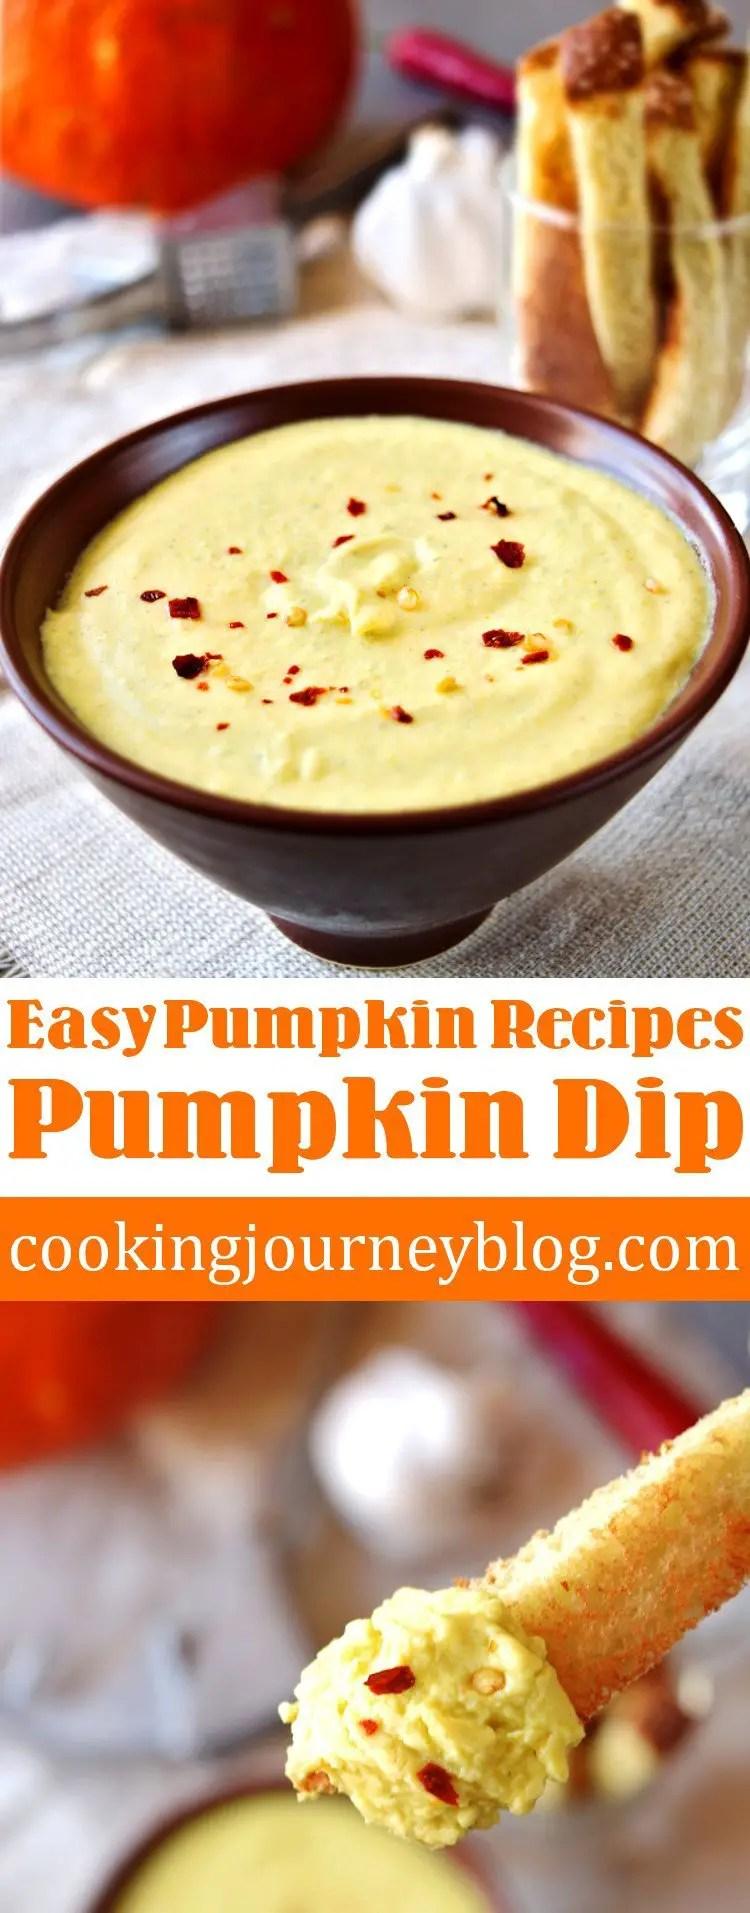 Pumpkin dip recipe – Easy pumpkin recipes pin